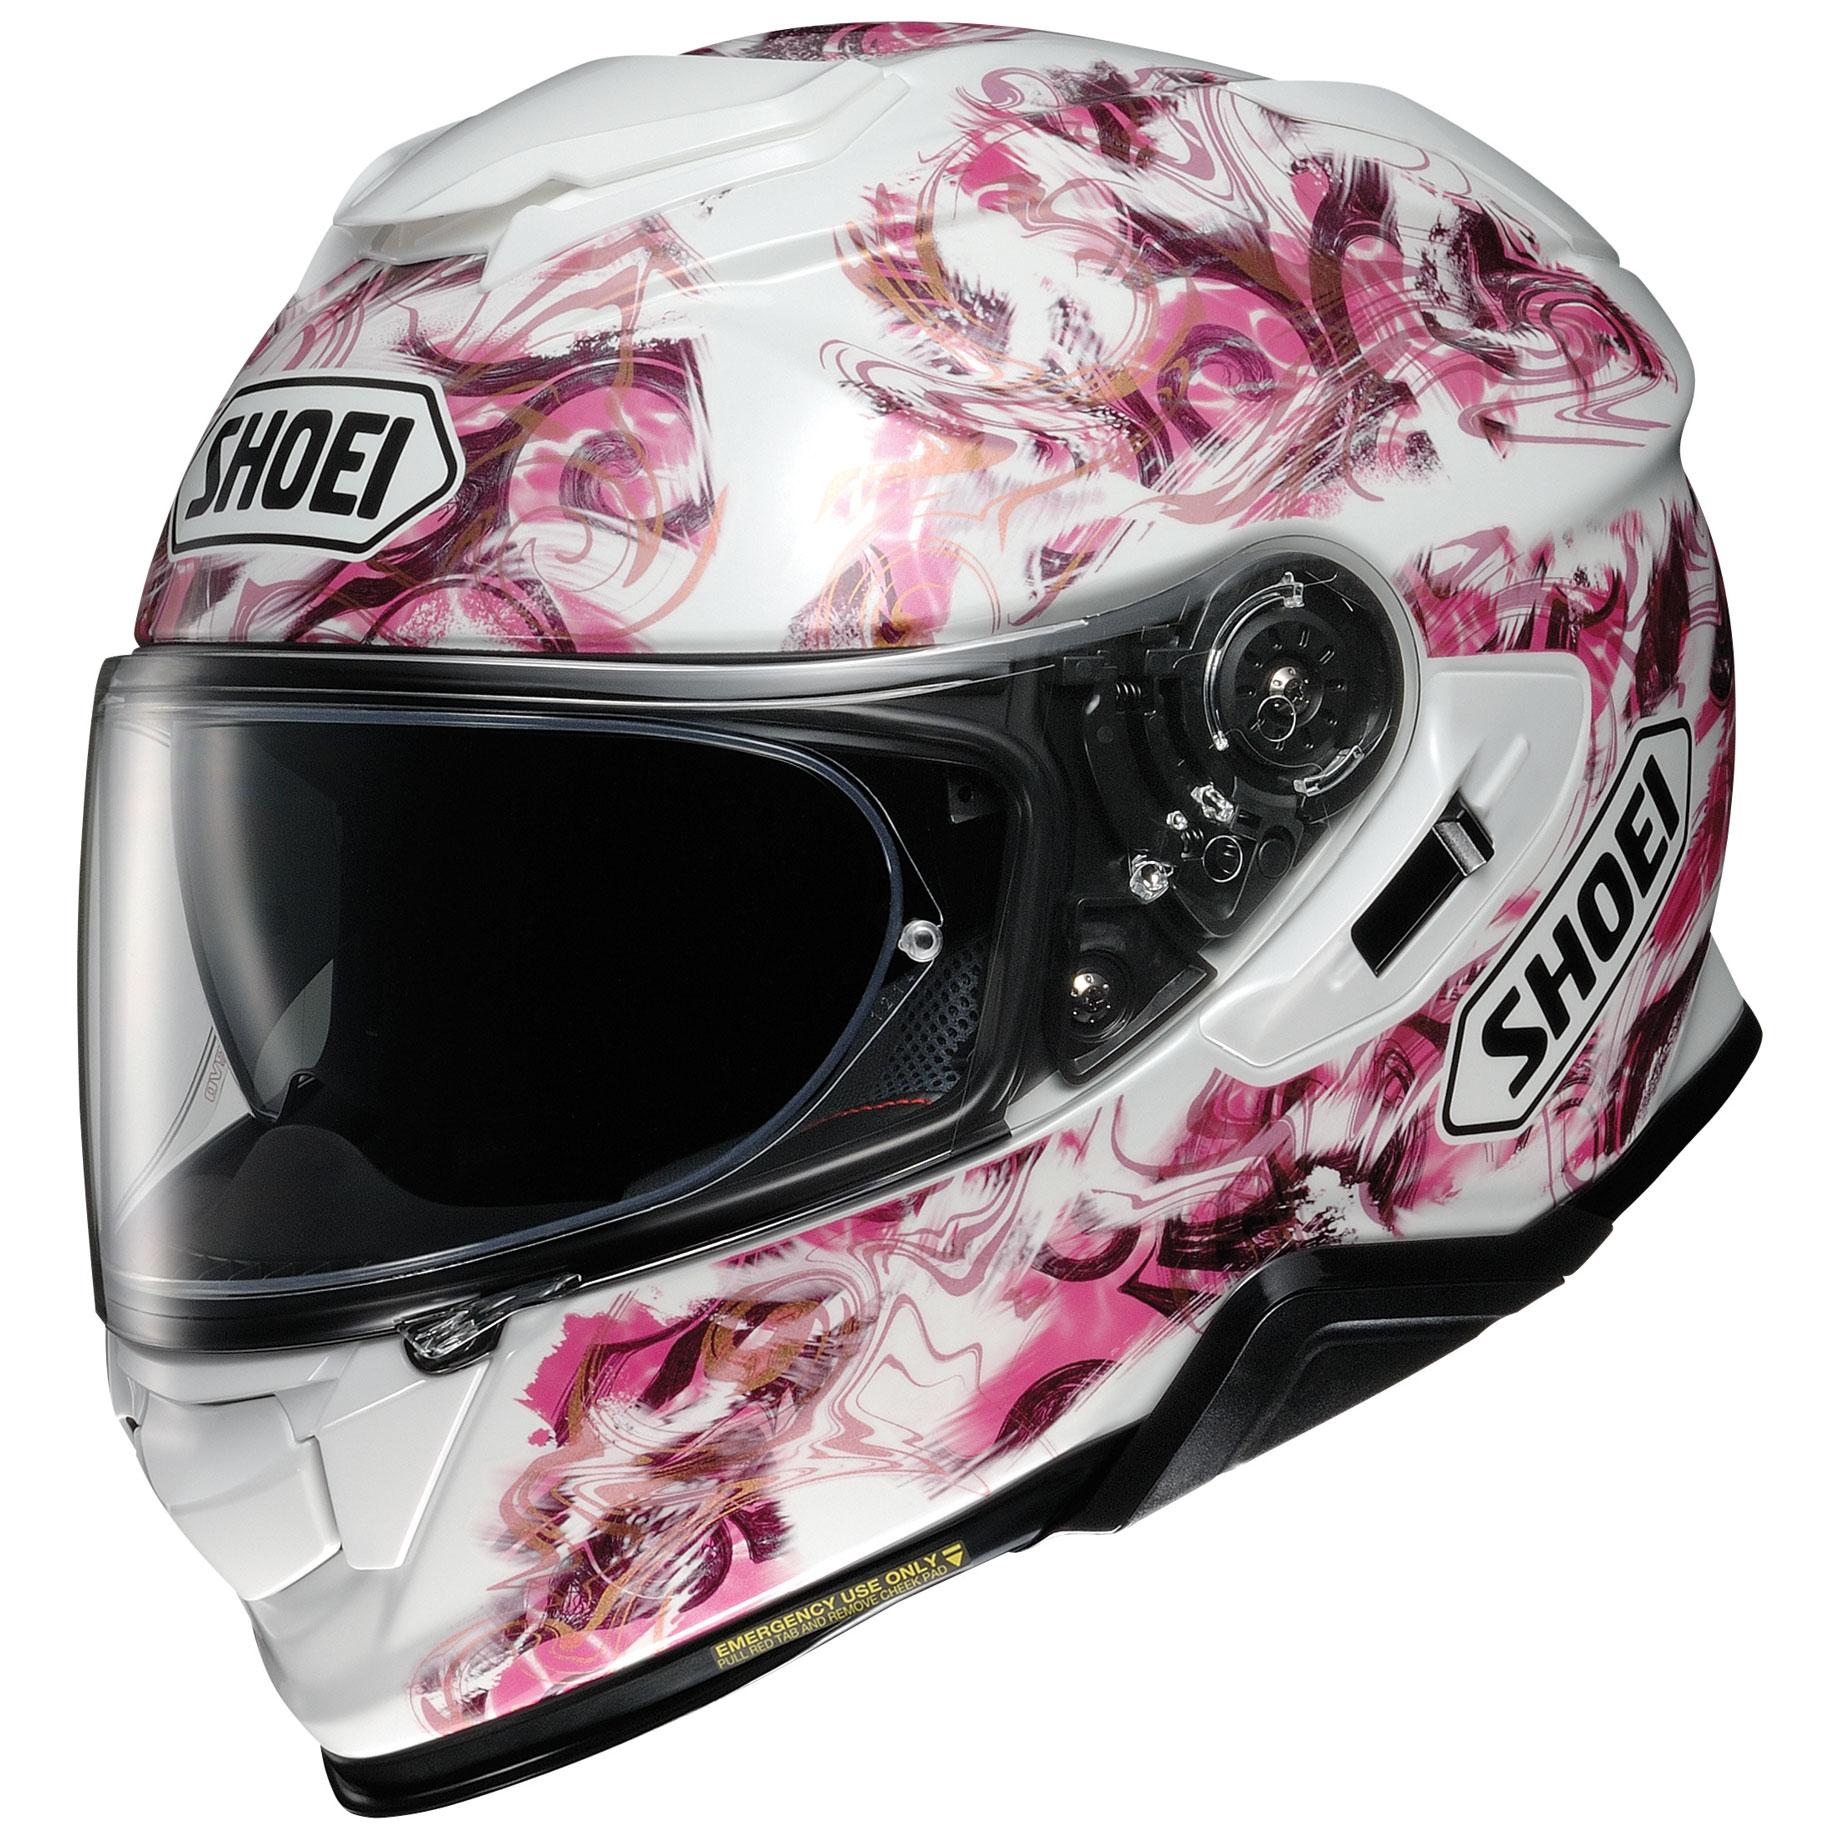 Shoei GT-Air II Conjure White/Pink Full Face Helmet